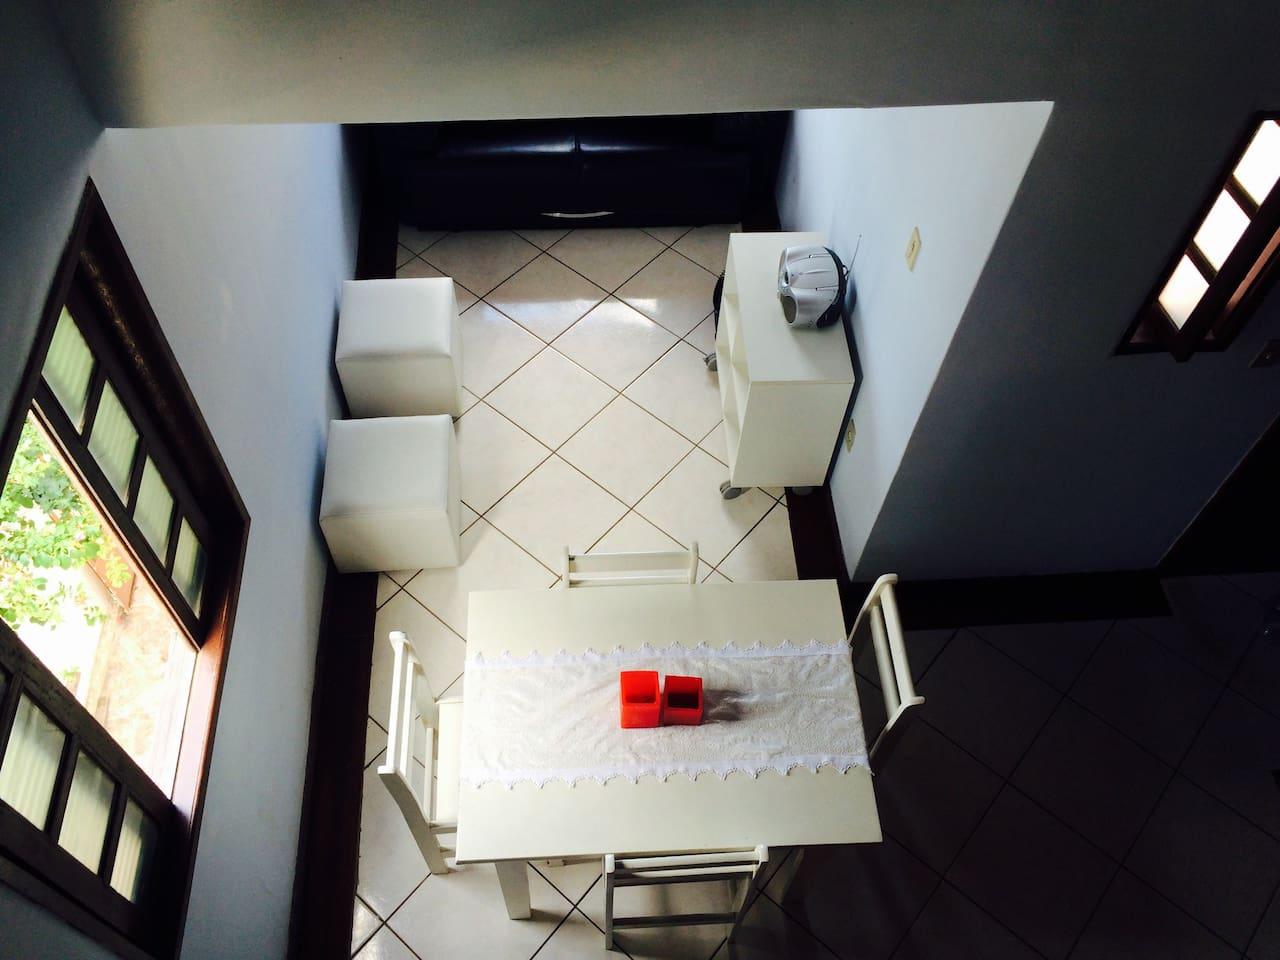 Foto tirada do segundo andar.